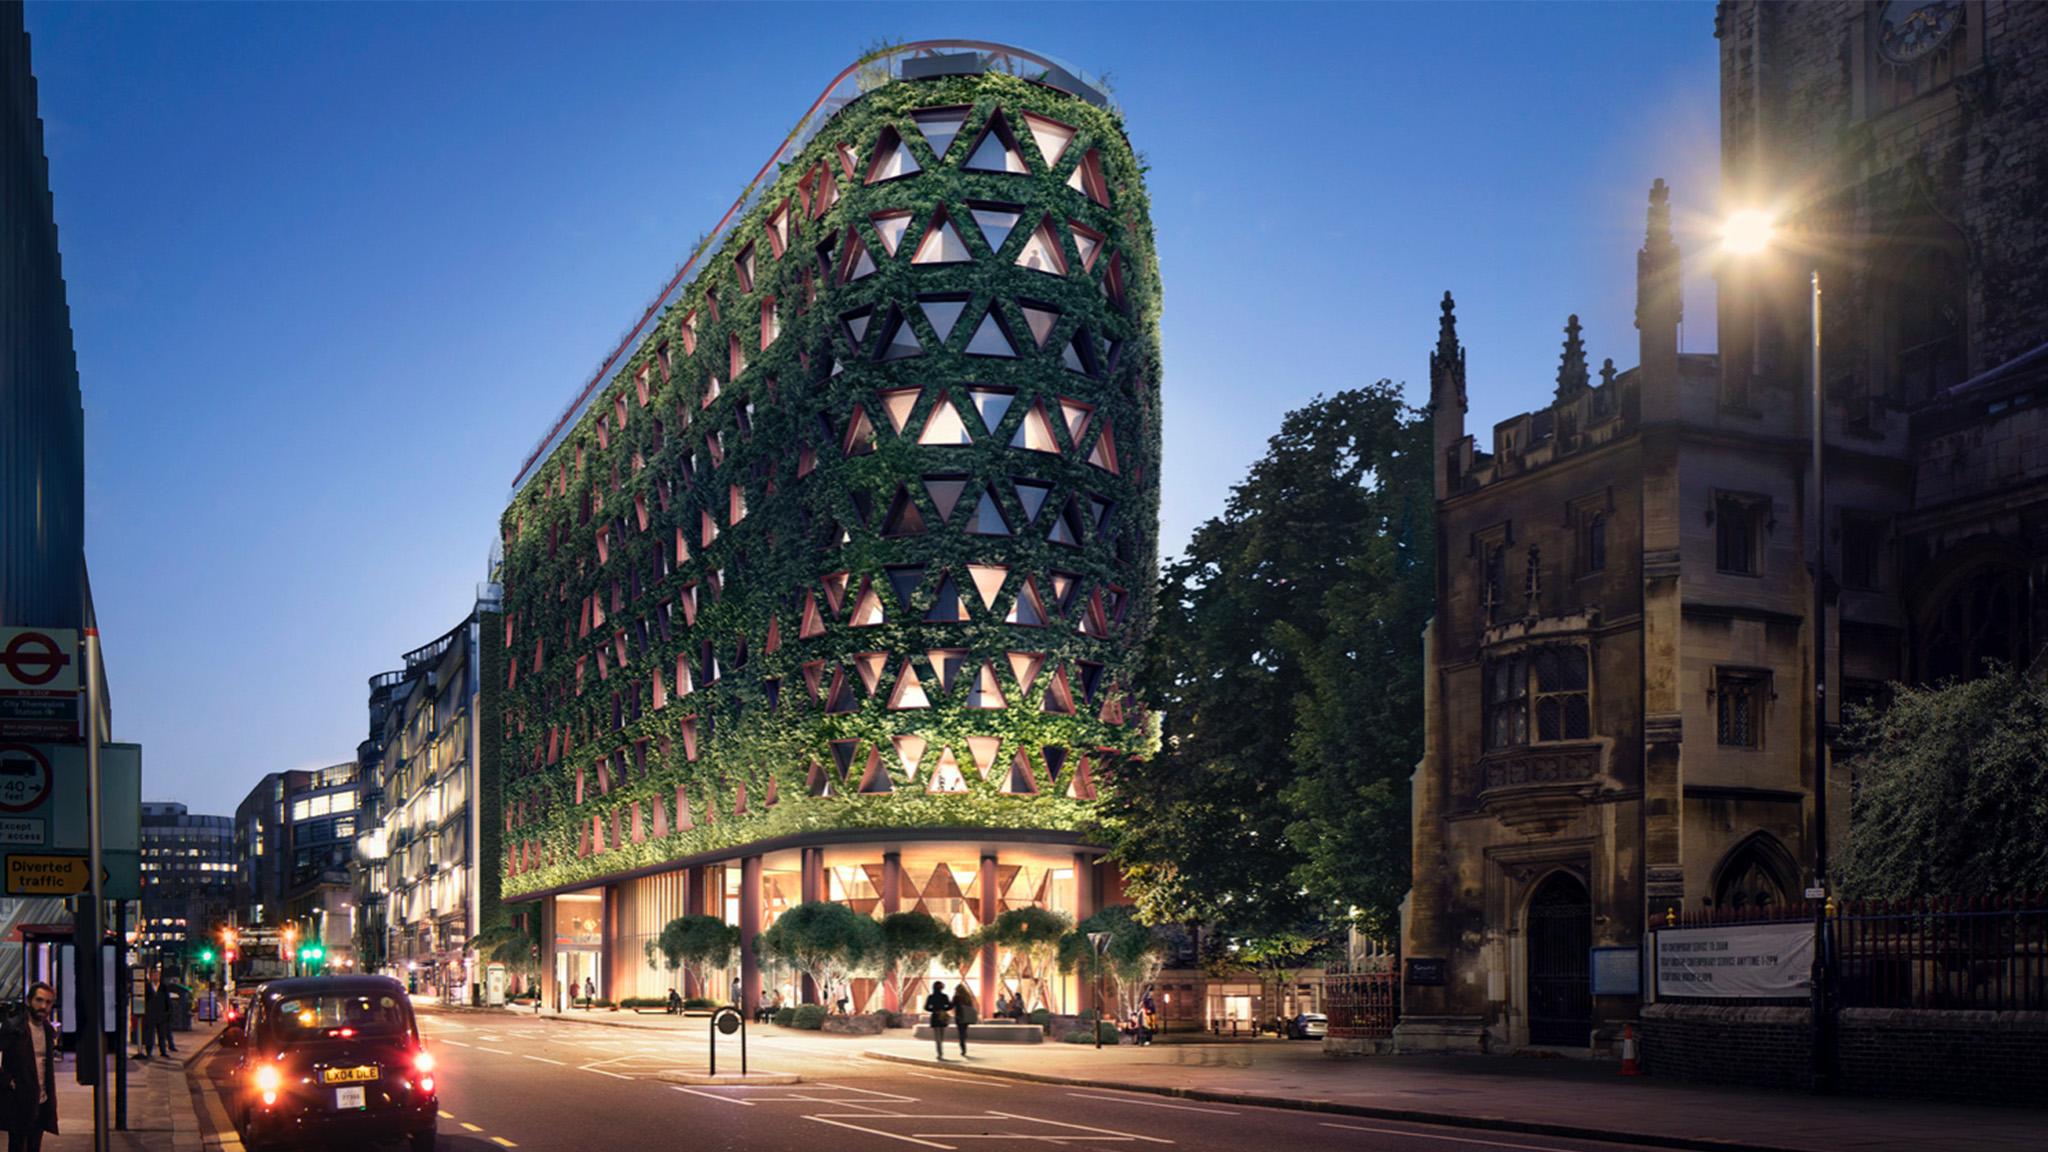 Resilient London - deadline 9 July